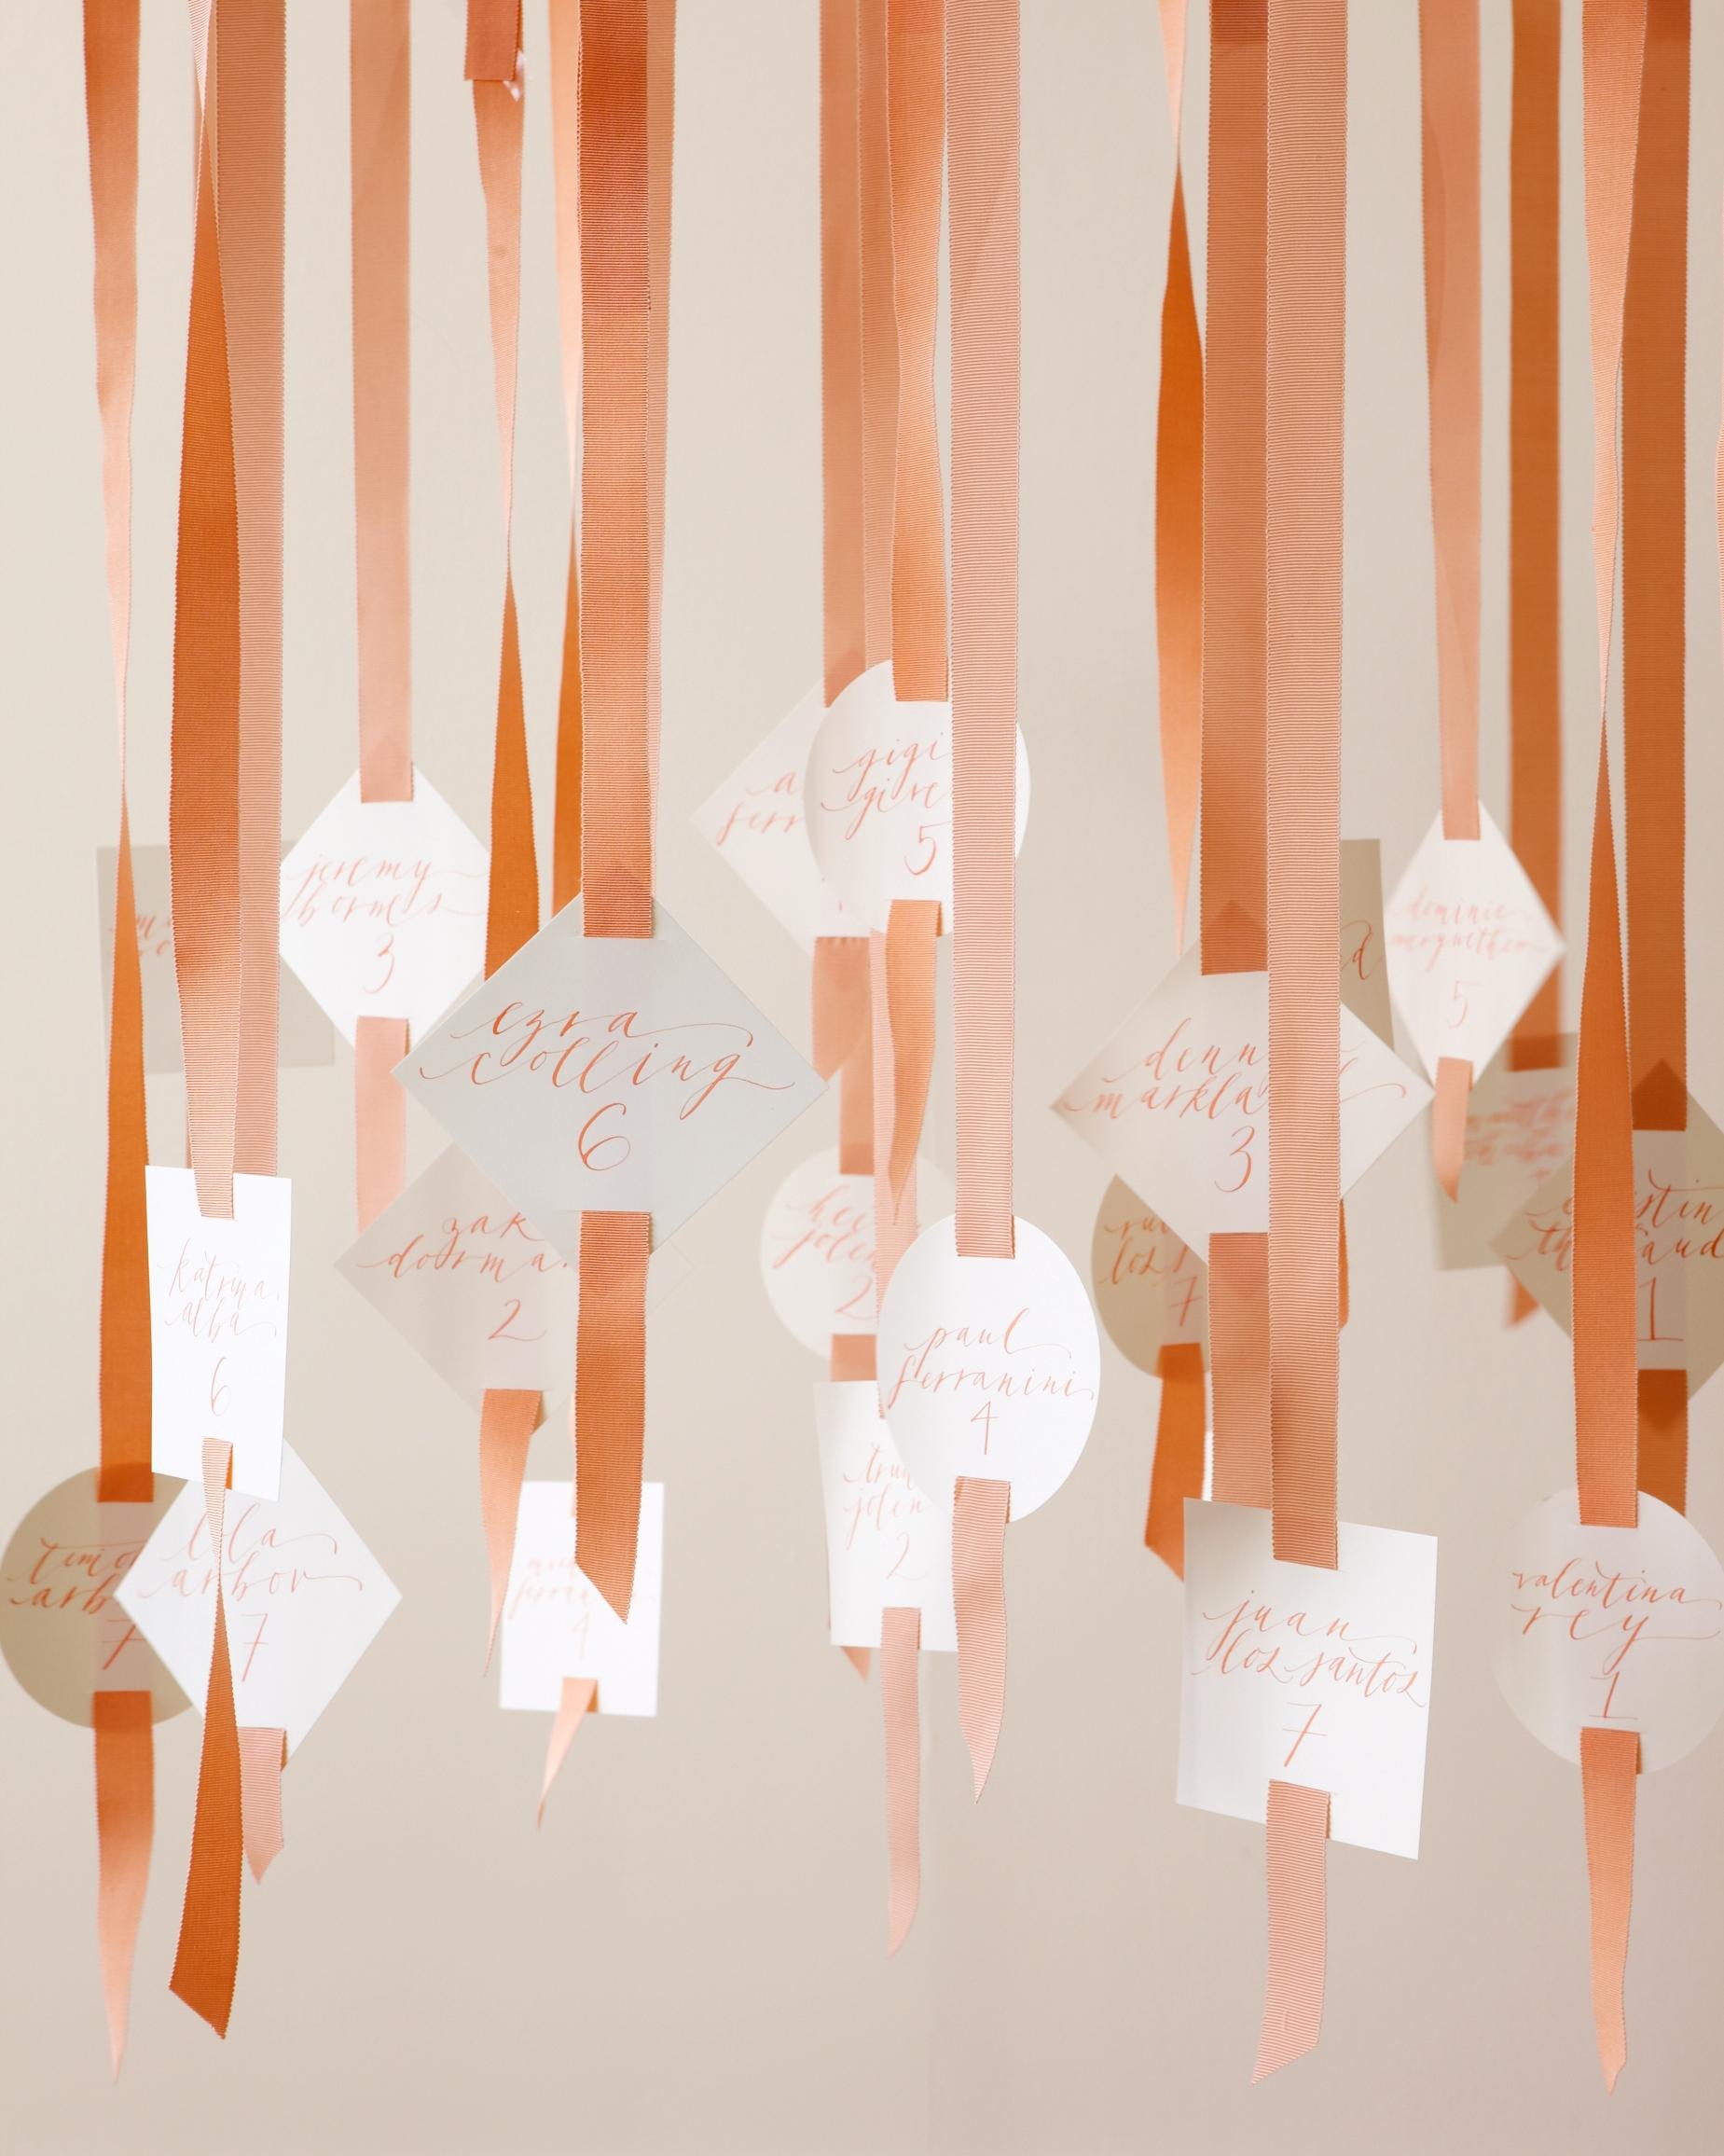 diy-sources-mjtrim-ribbons-wd107050ecards06-1014.jpg